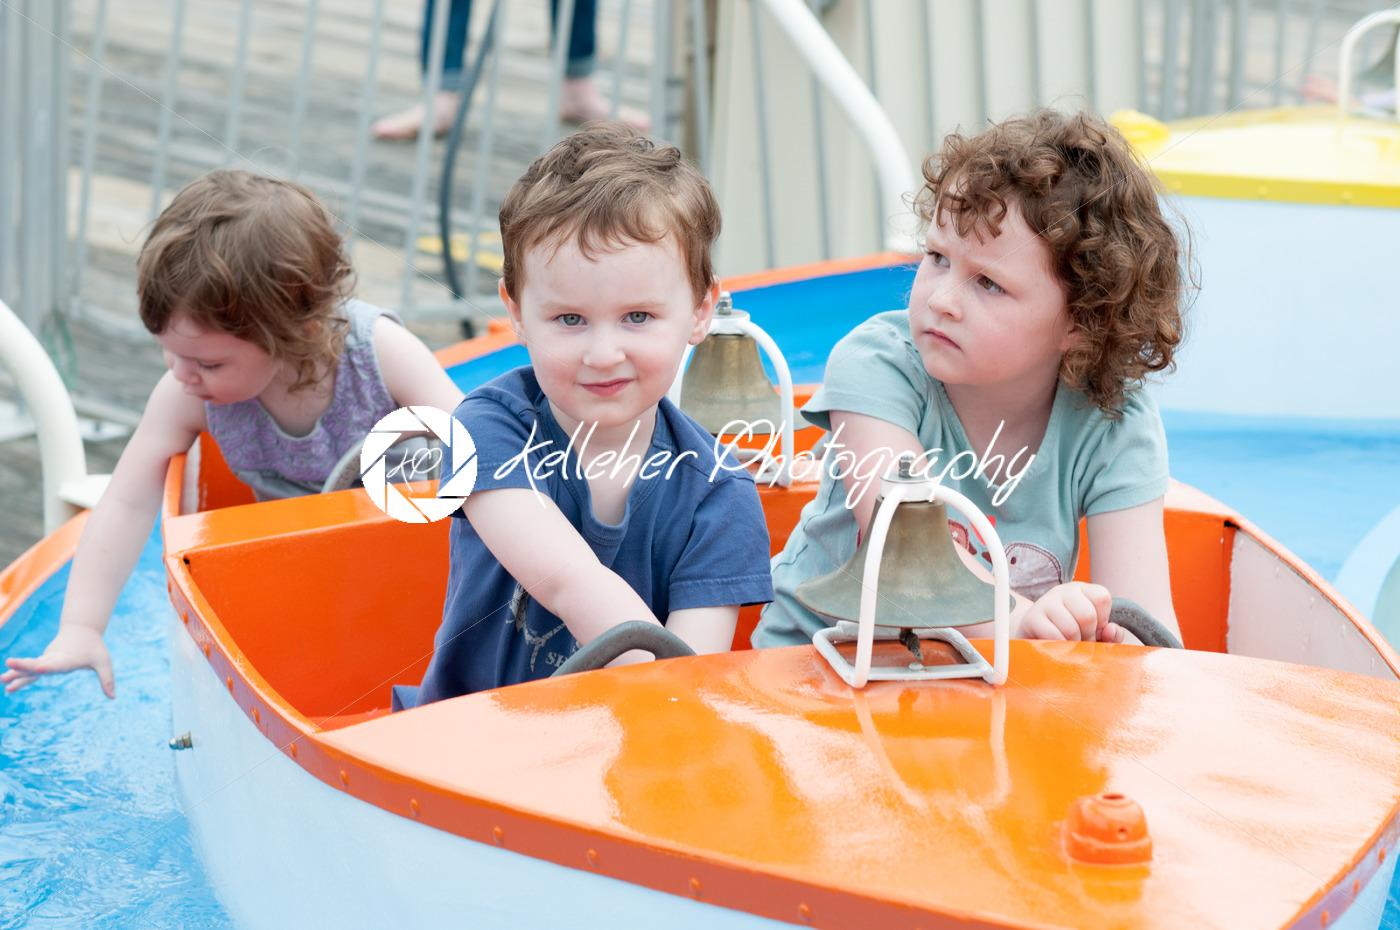 Young toddler sibblings having fun on boardwalk amusement ride - Kelleher Photography Store